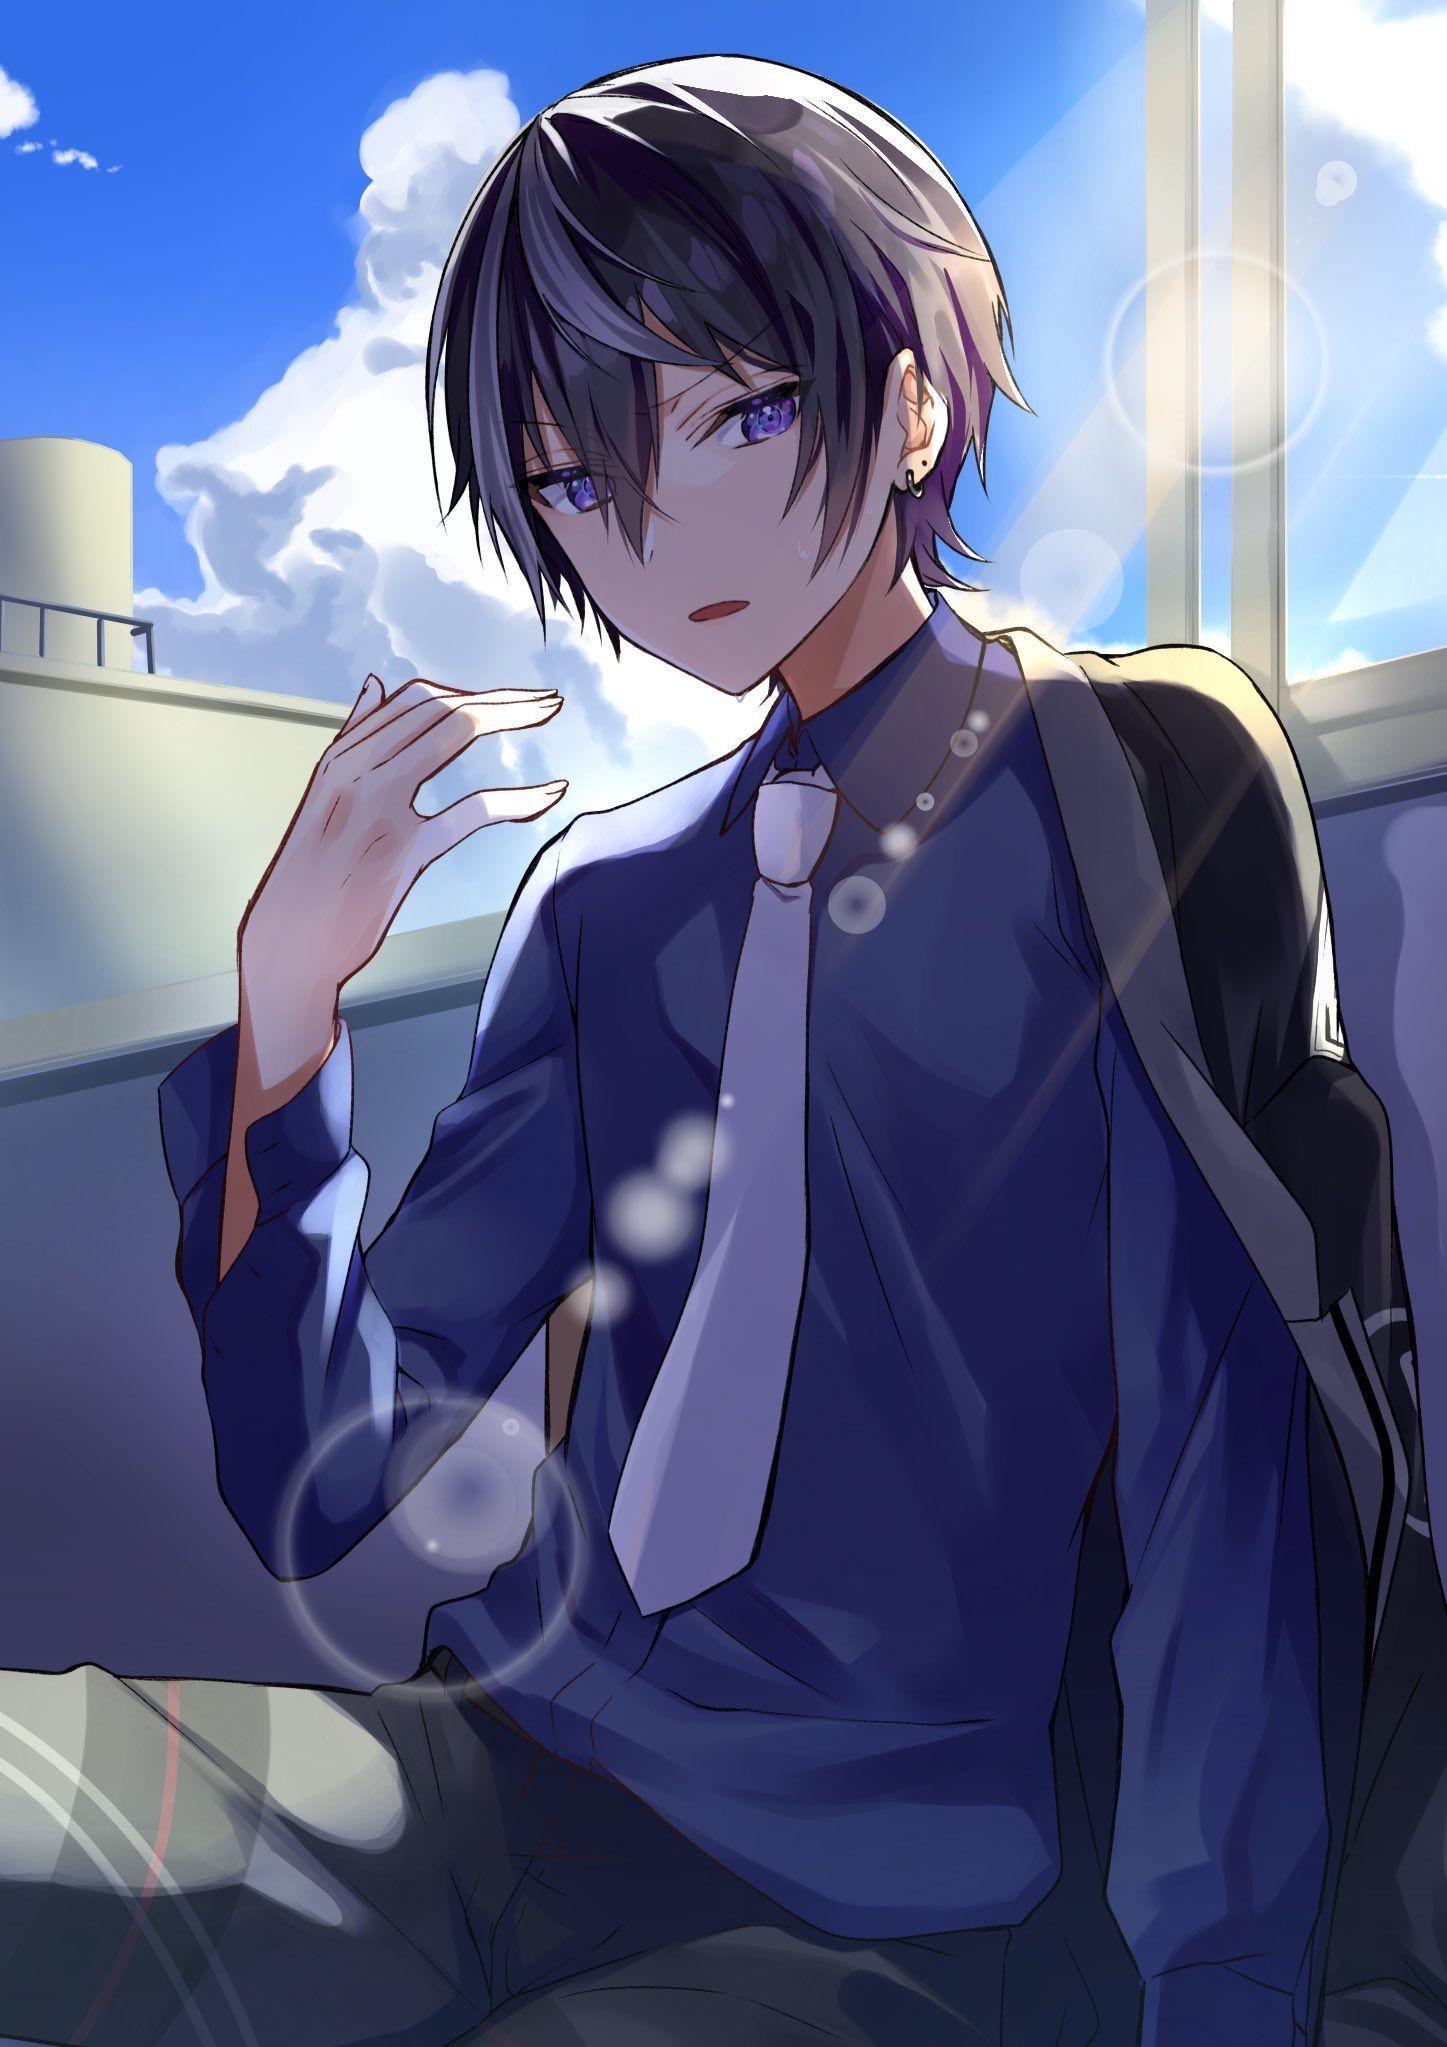 Pin by SailerHoiEevee . on Anime Ocs Anime drawings boy